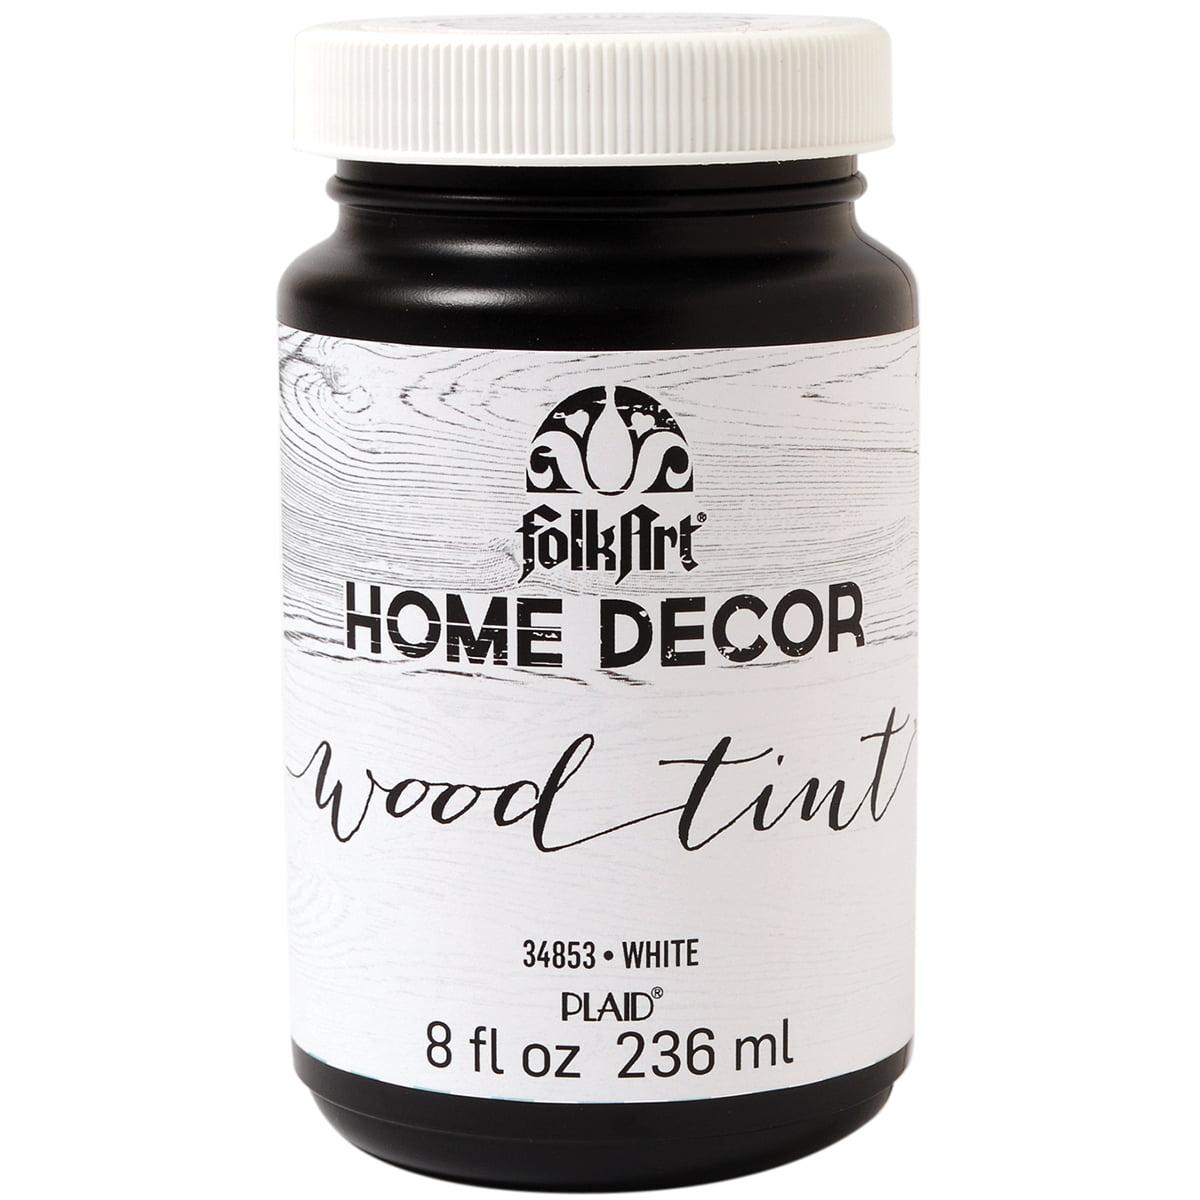 FolkArt Home Decor Wood Tint-White